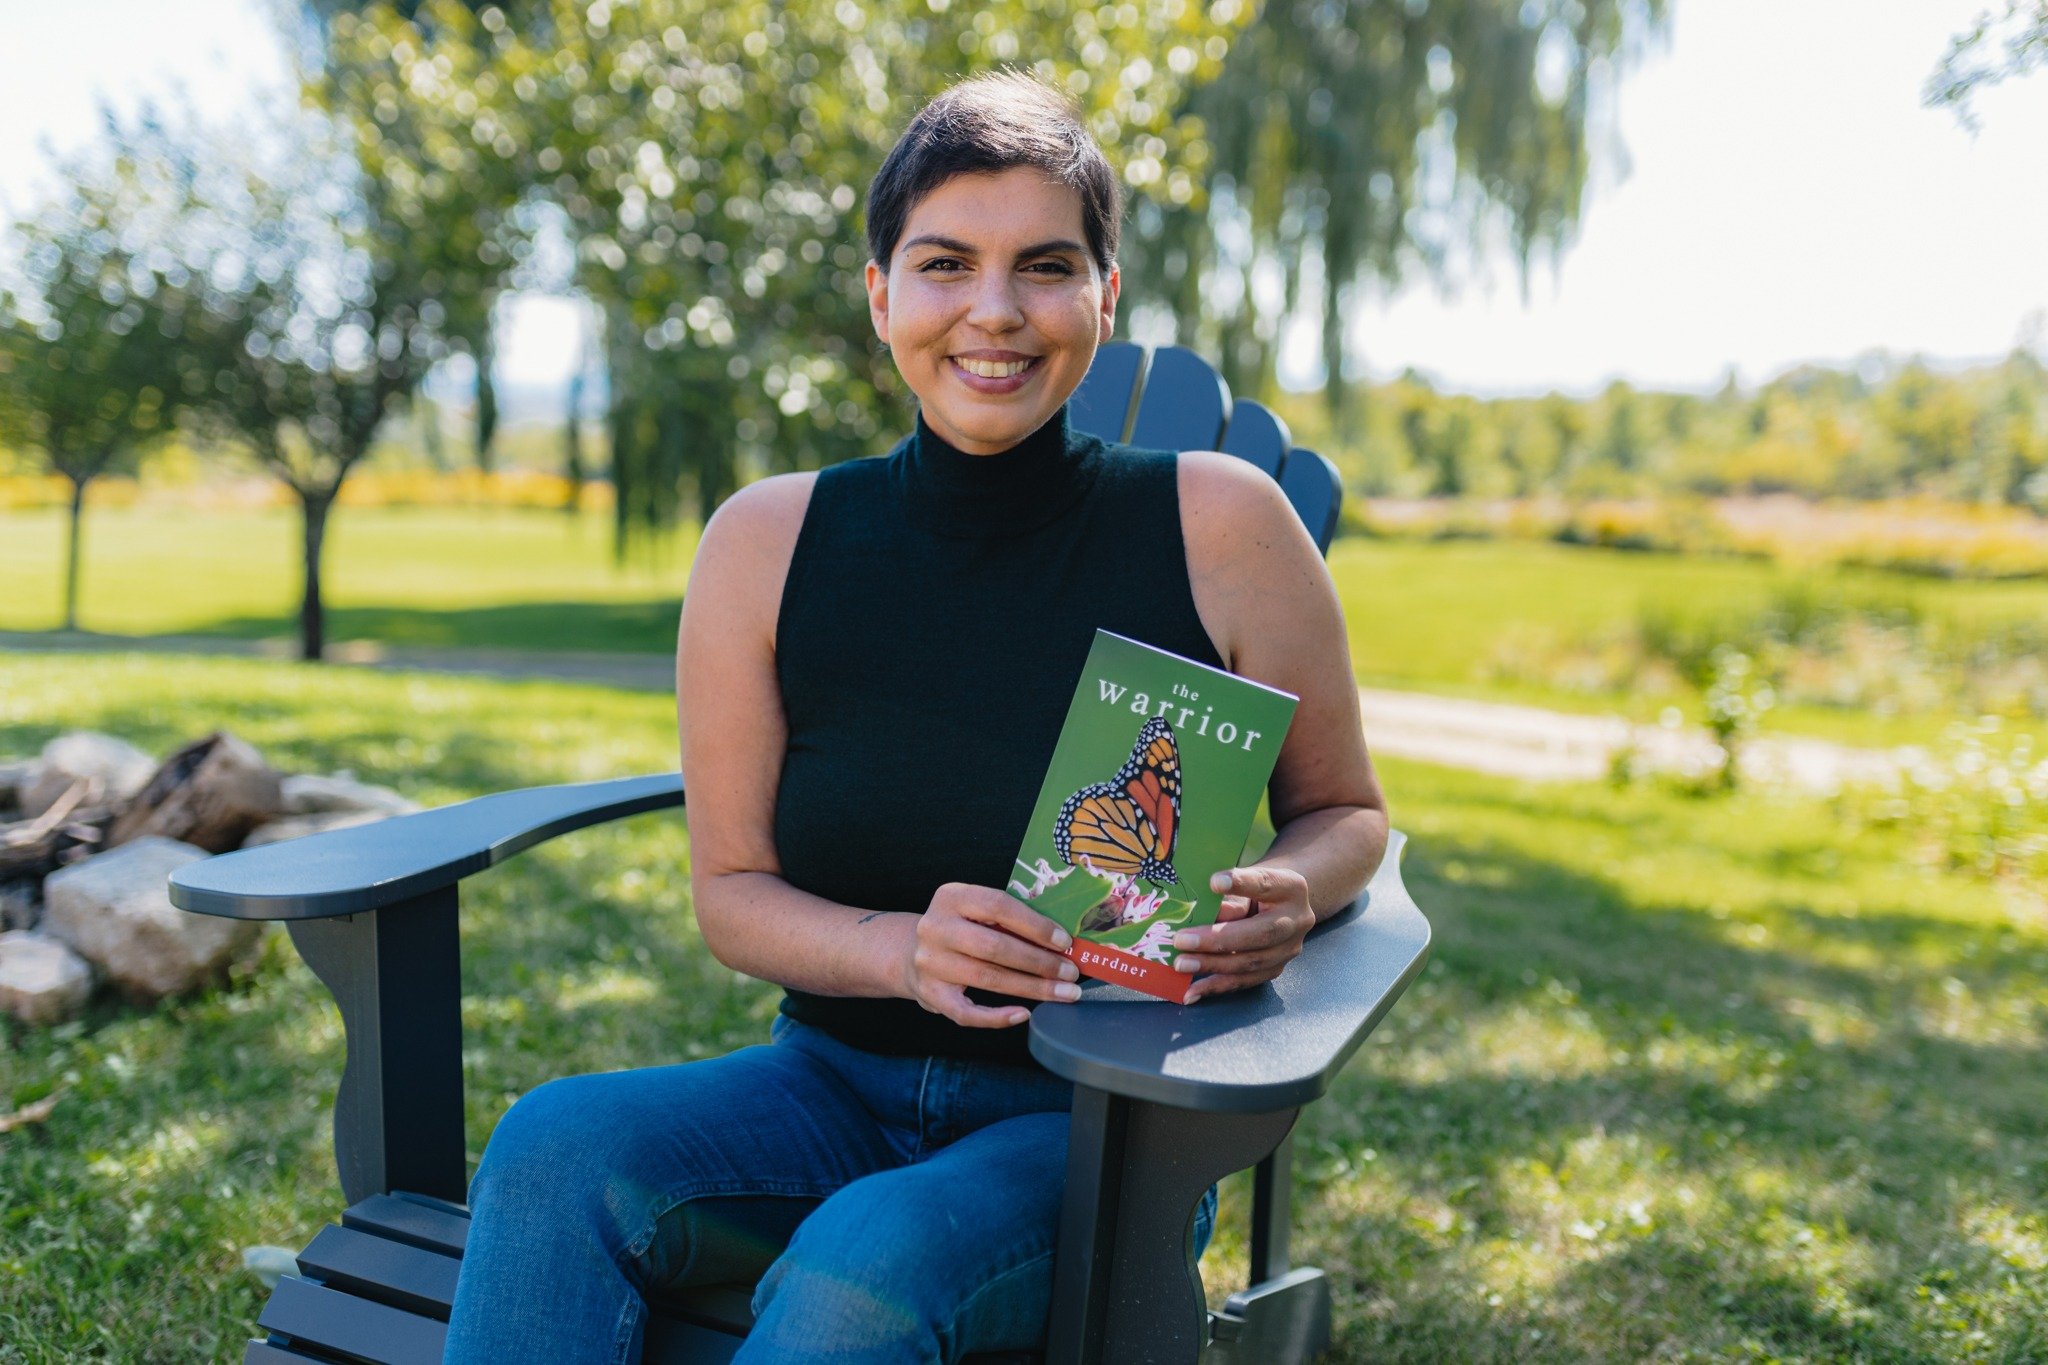 Ryan Gardner with her book